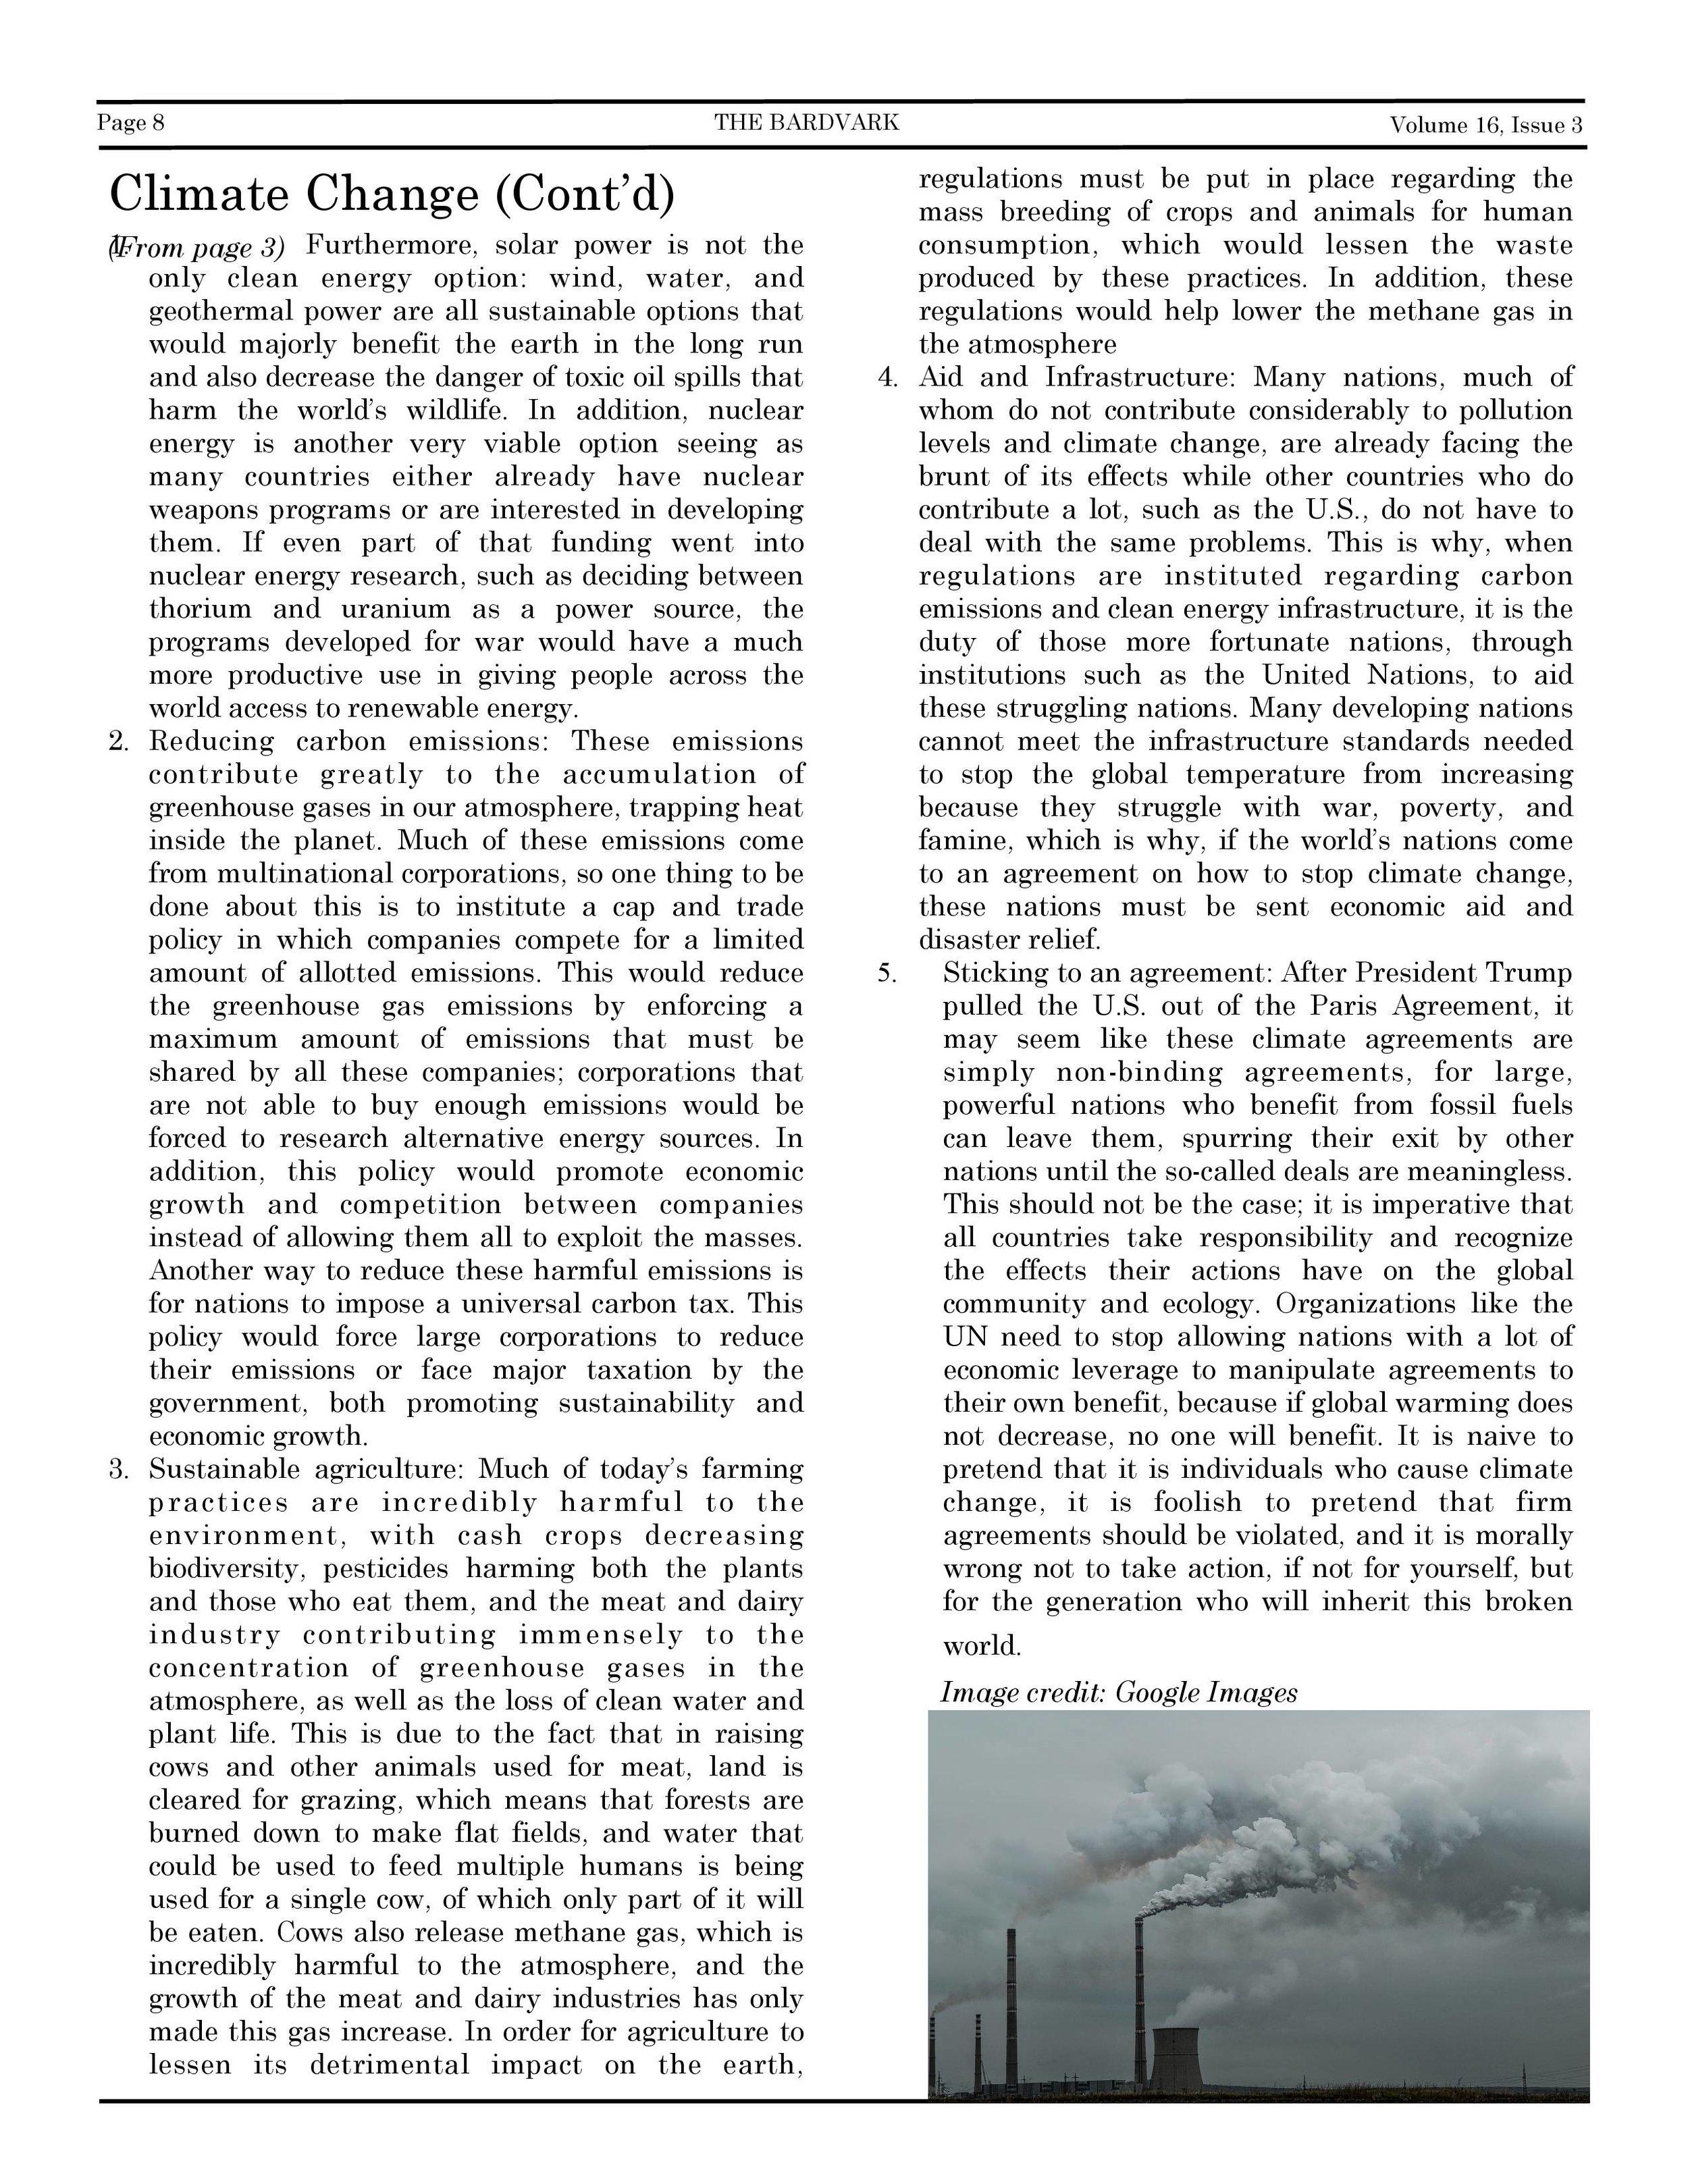 Issue 6 February 2019-8.jpg